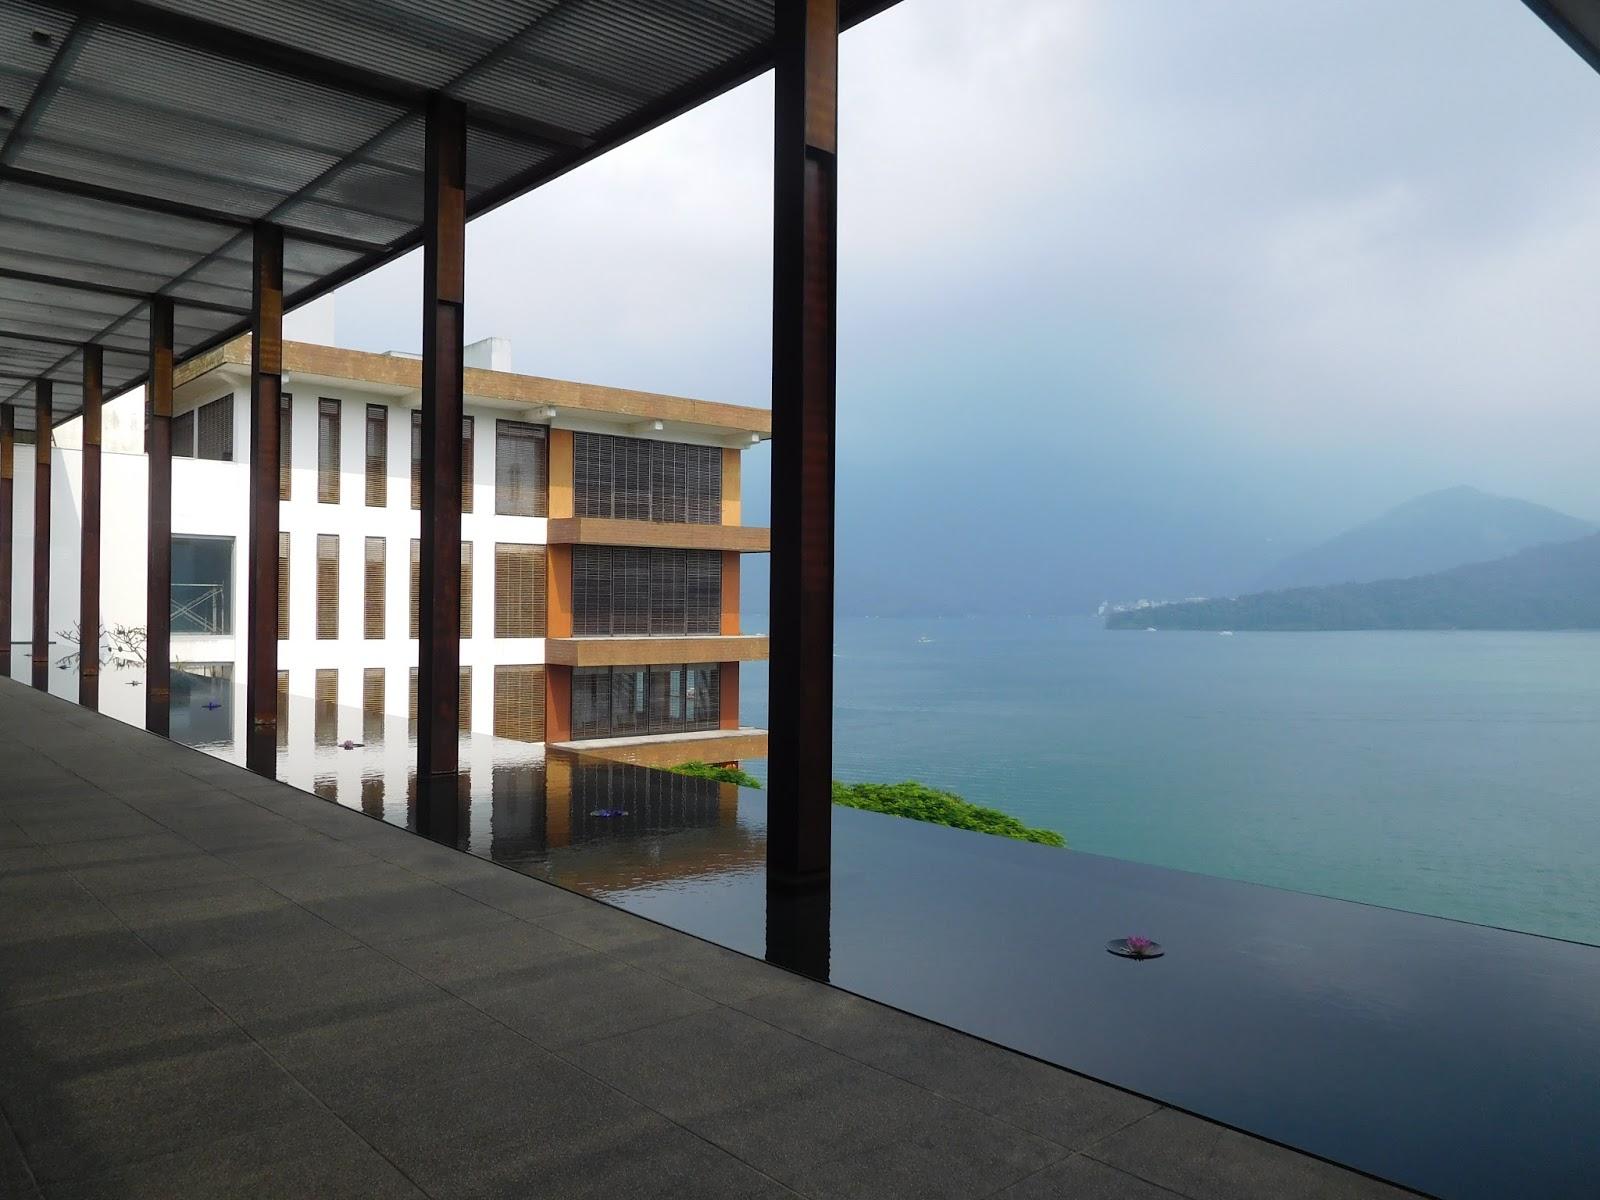 Sophie's Hotel Experience: 湖光山色之中的一處靜謐-日月潭涵碧樓(The Lalu, Sun Moon Lake)/楔子與泳池篇